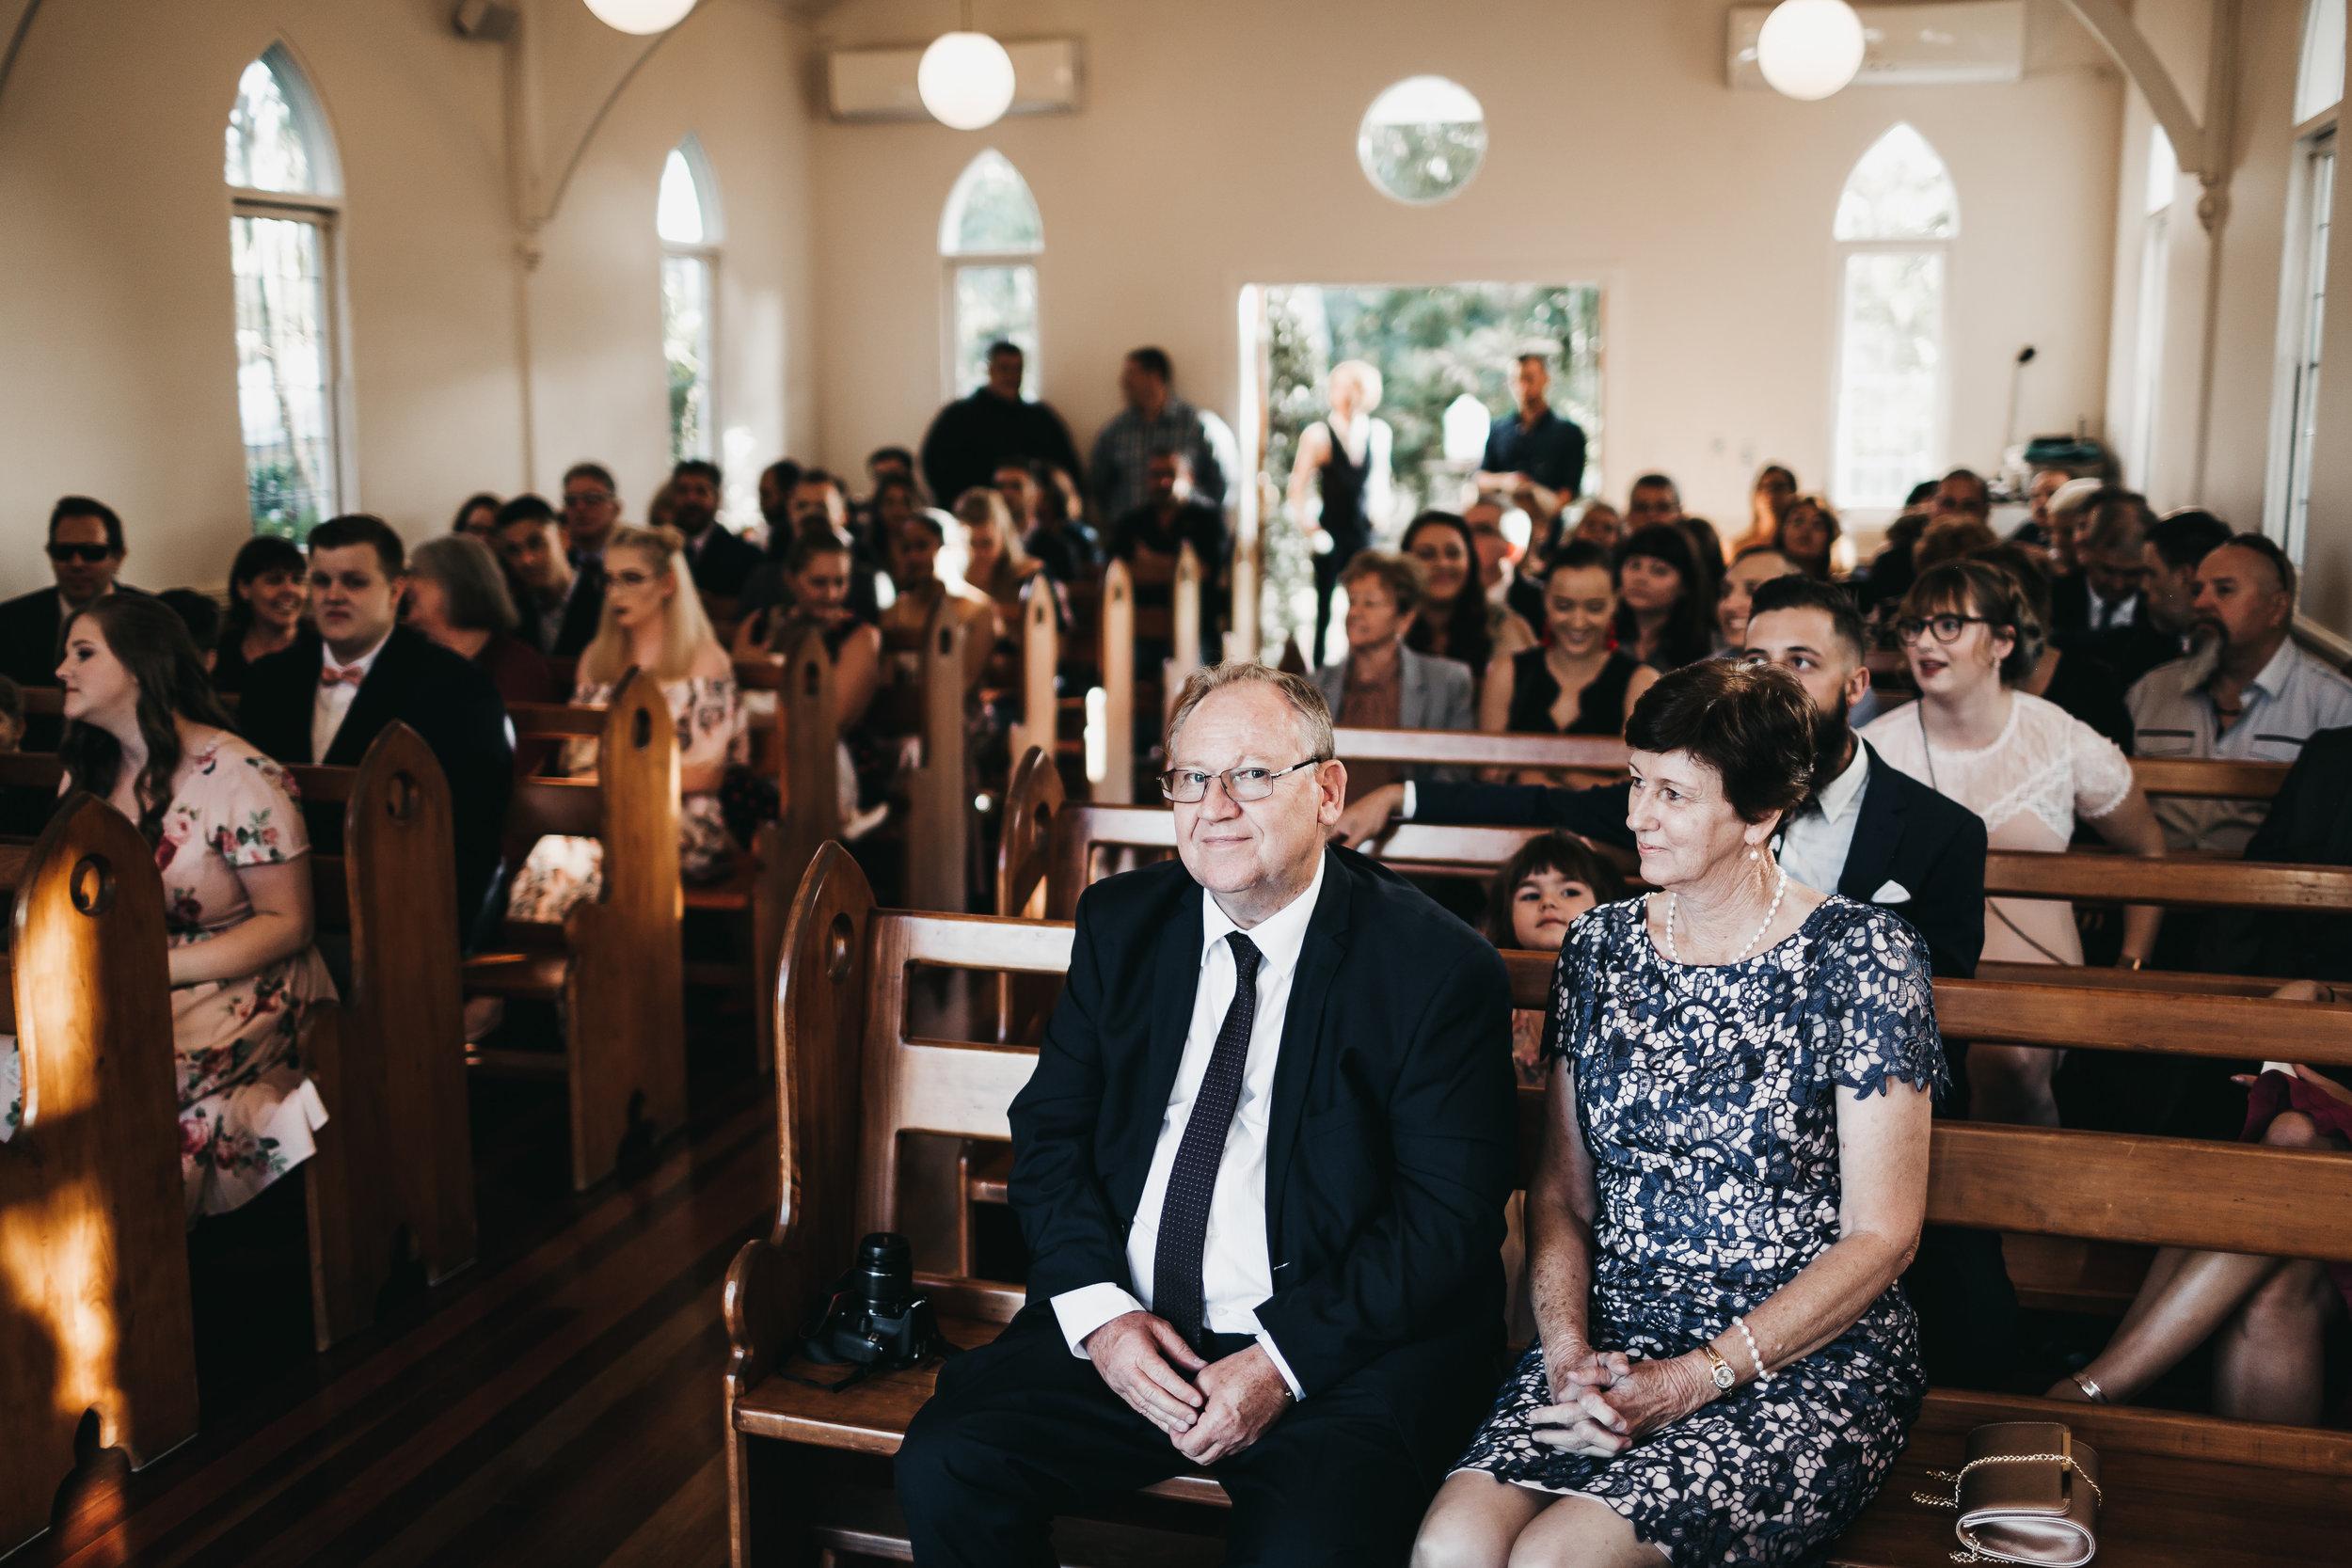 bondwedding-292.jpg